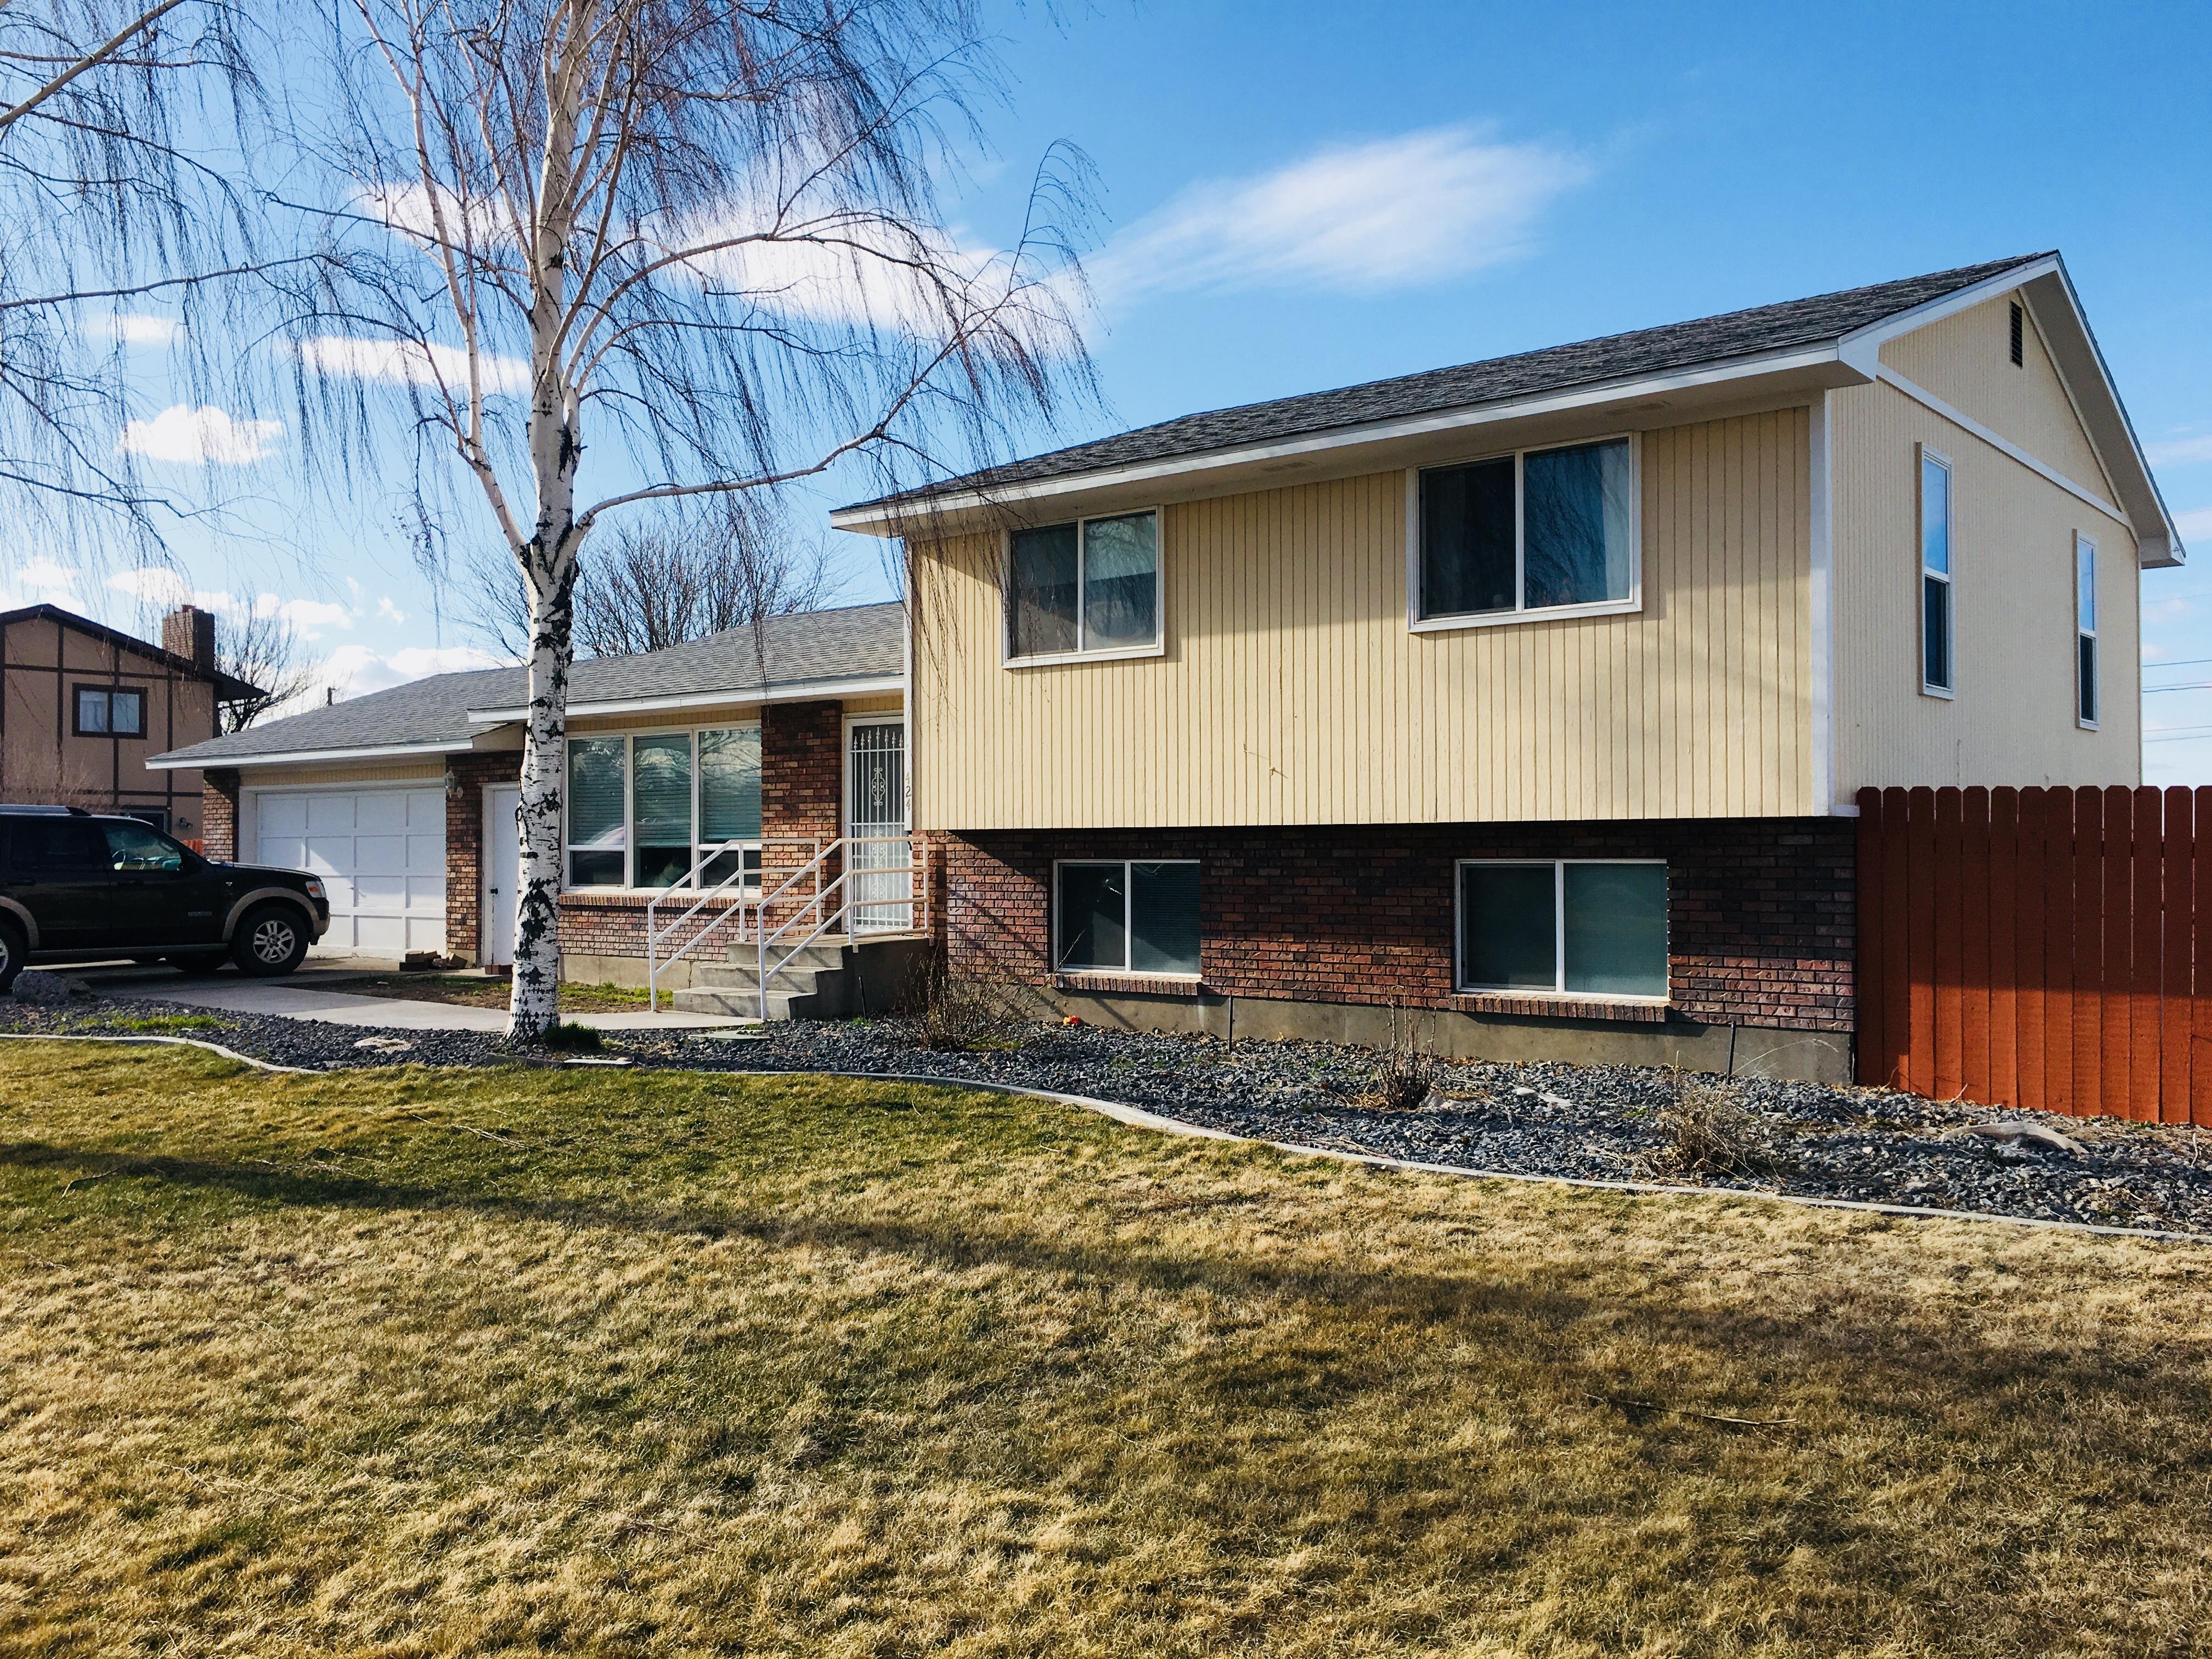 424 N Val Verde Dr, Rupert, Idaho